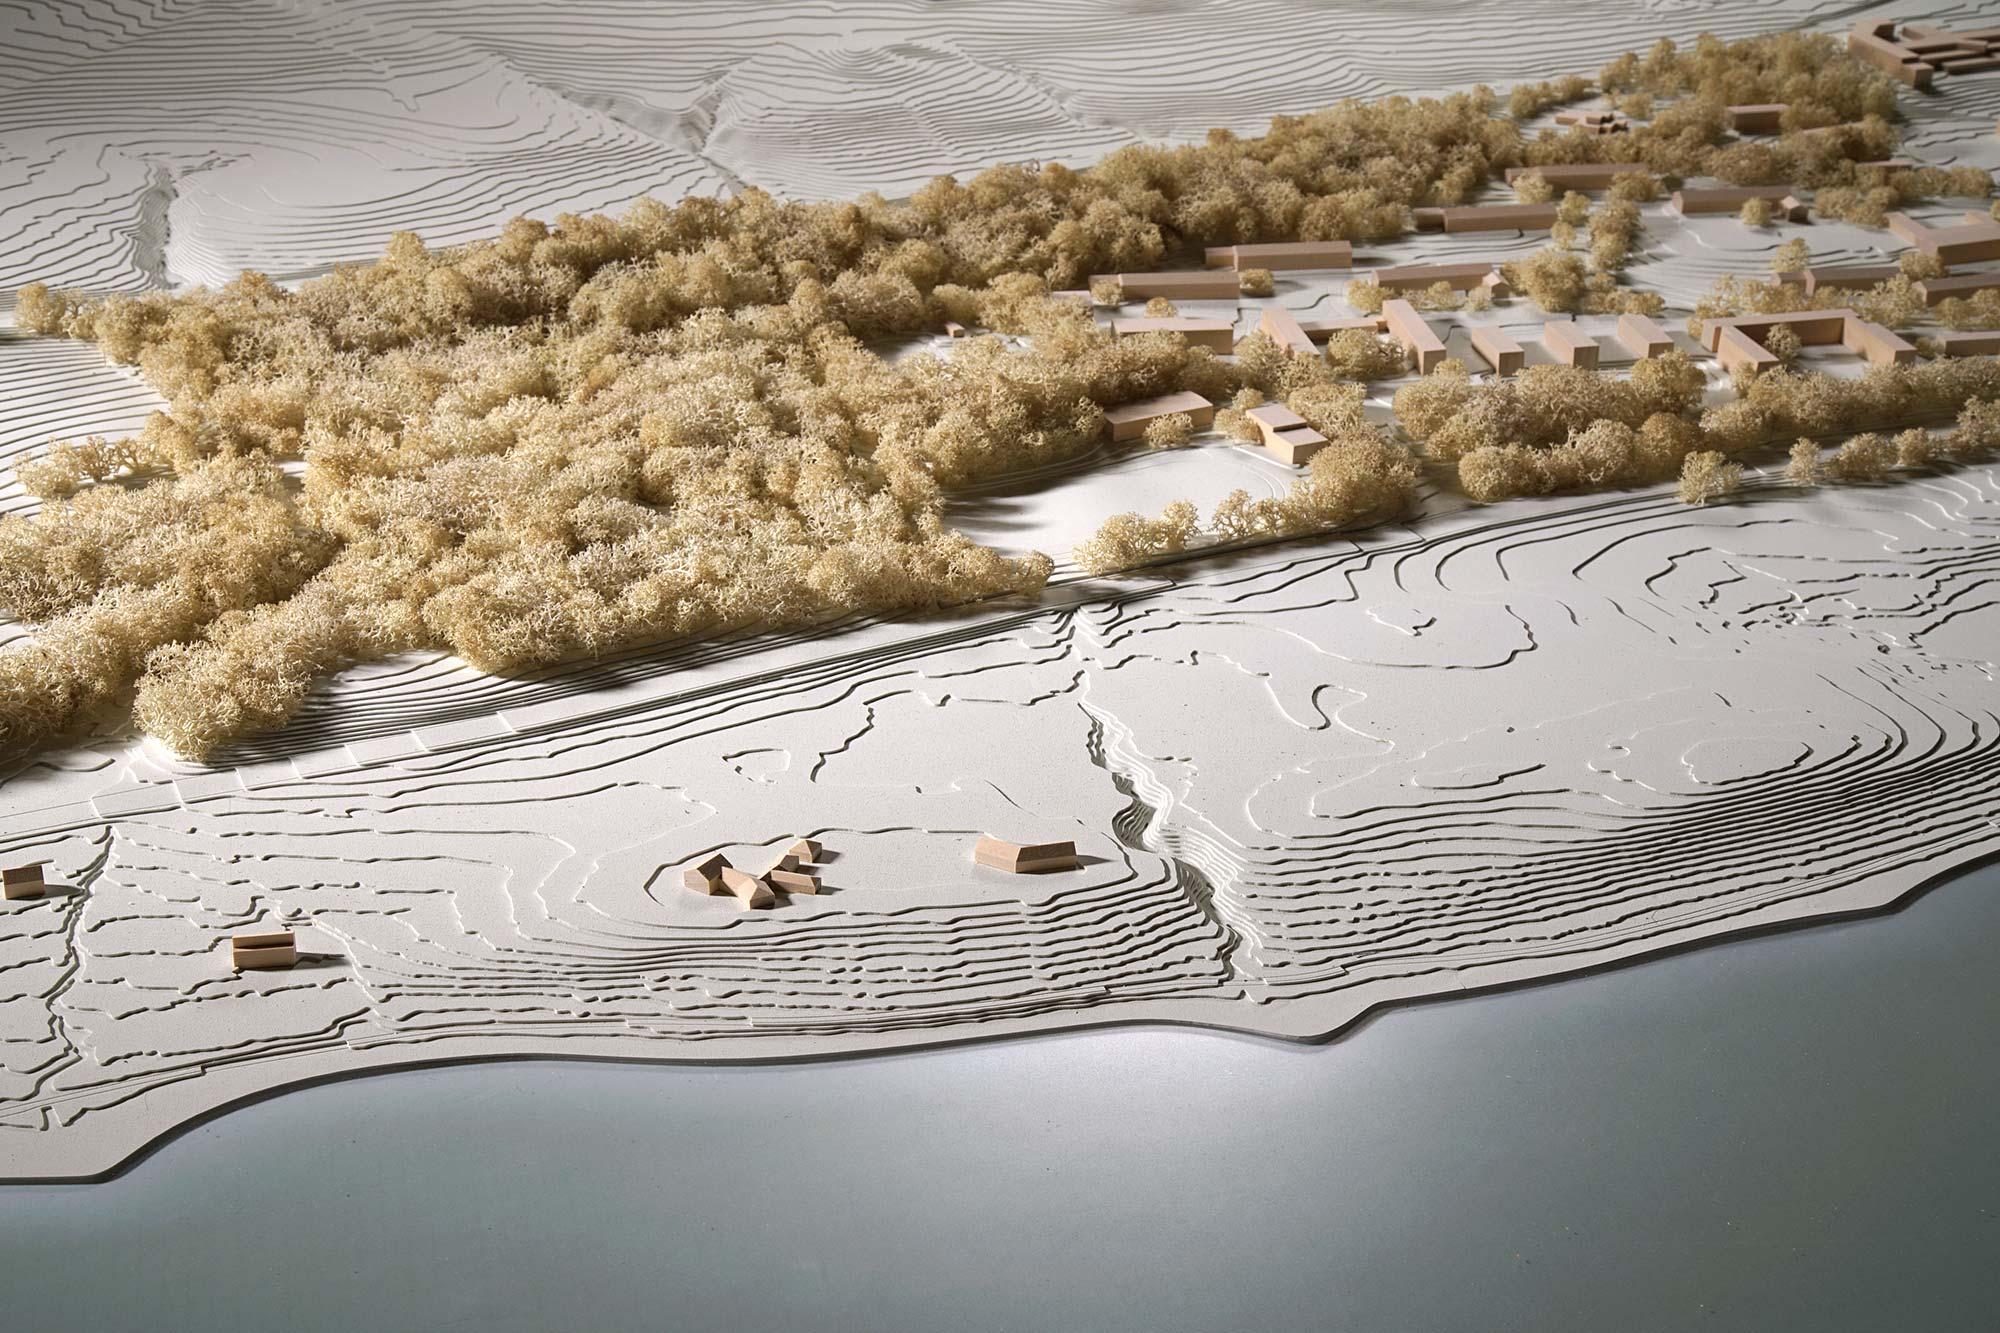 Modell des Ufers bei Feldafing